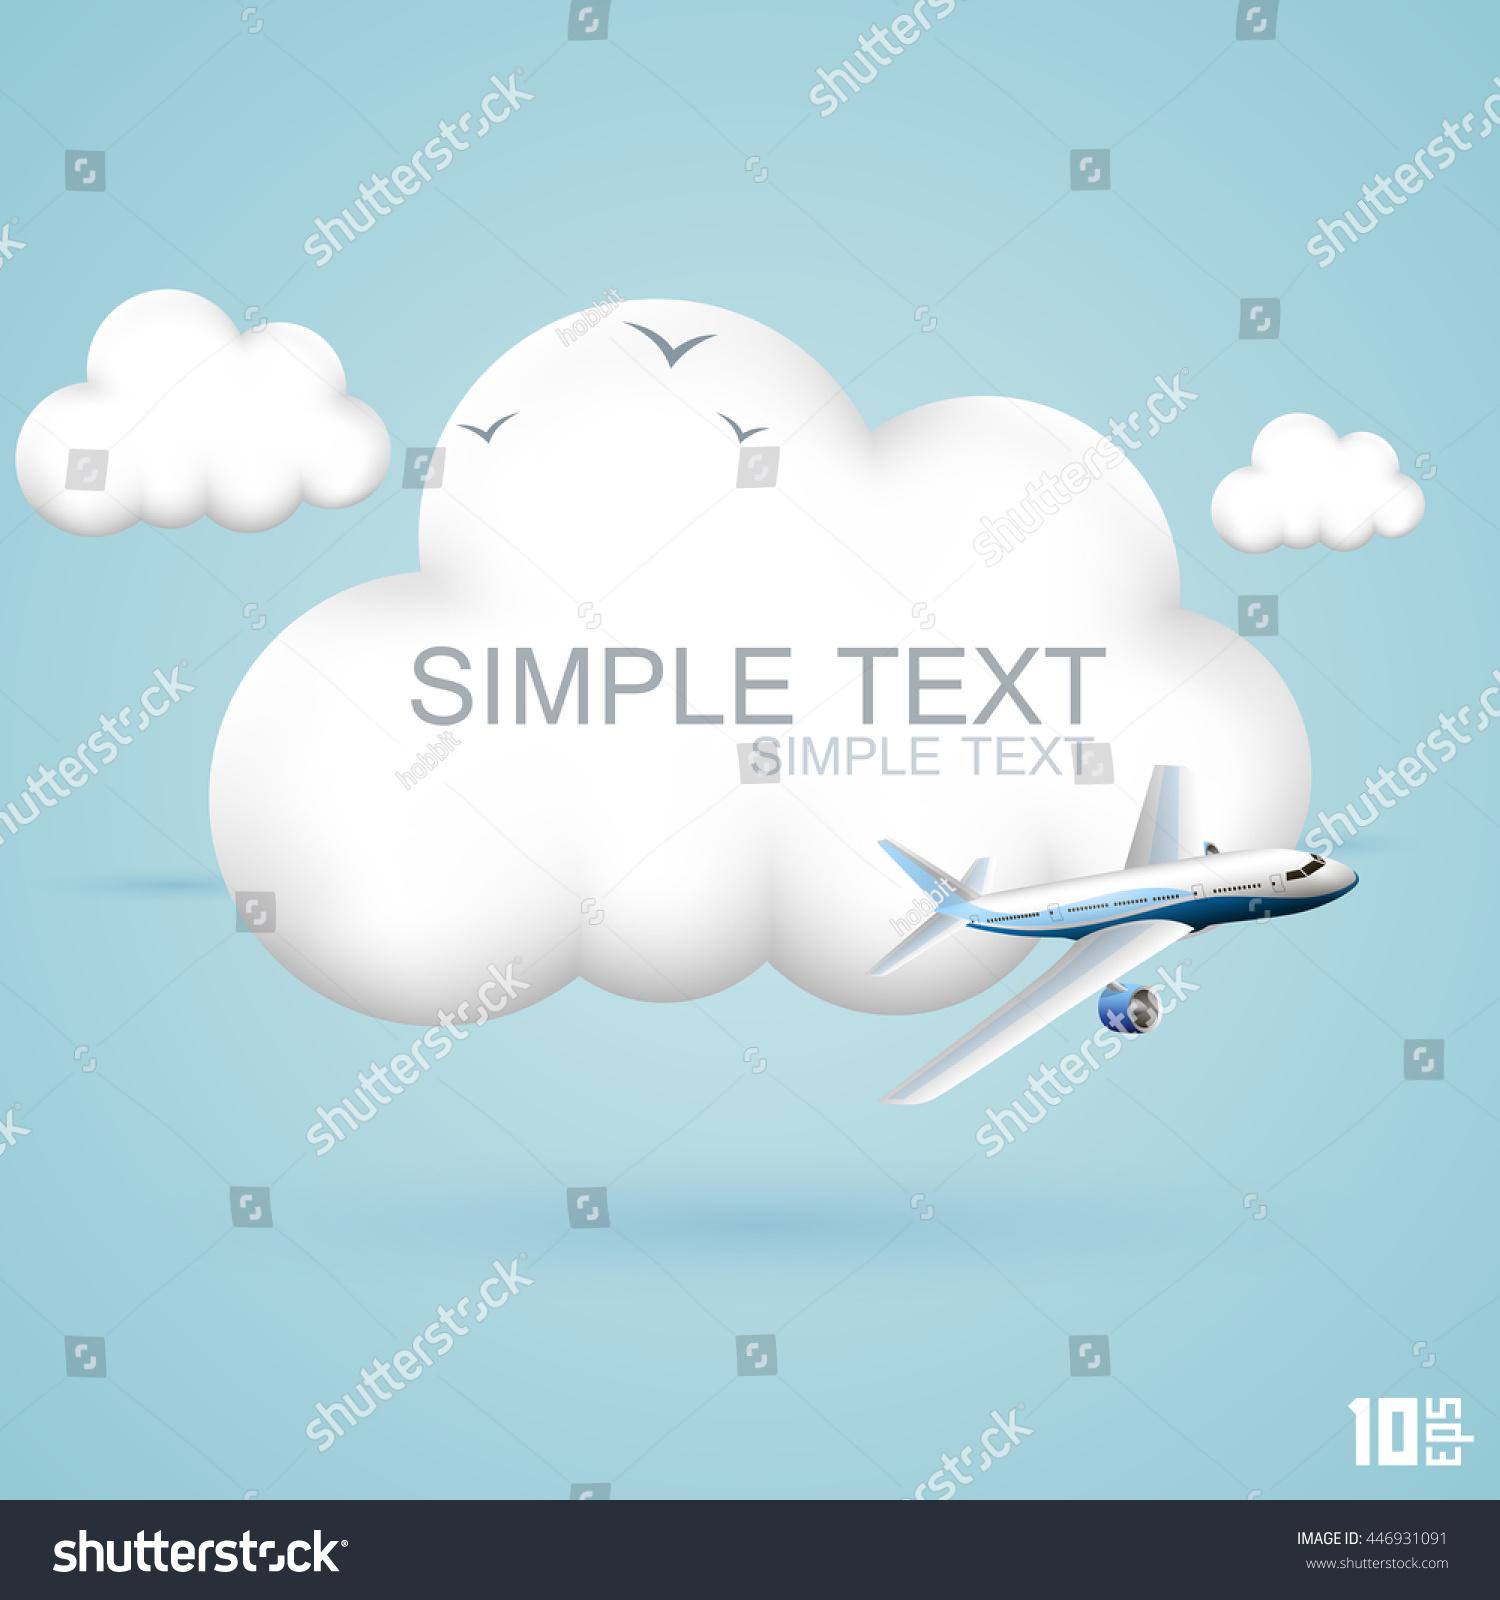 Plane flies clouds symbol 3d cloud stock vector 446931091 the plane flies in the clouds symbol of 3d cloud and plane concept travel biocorpaavc Gallery